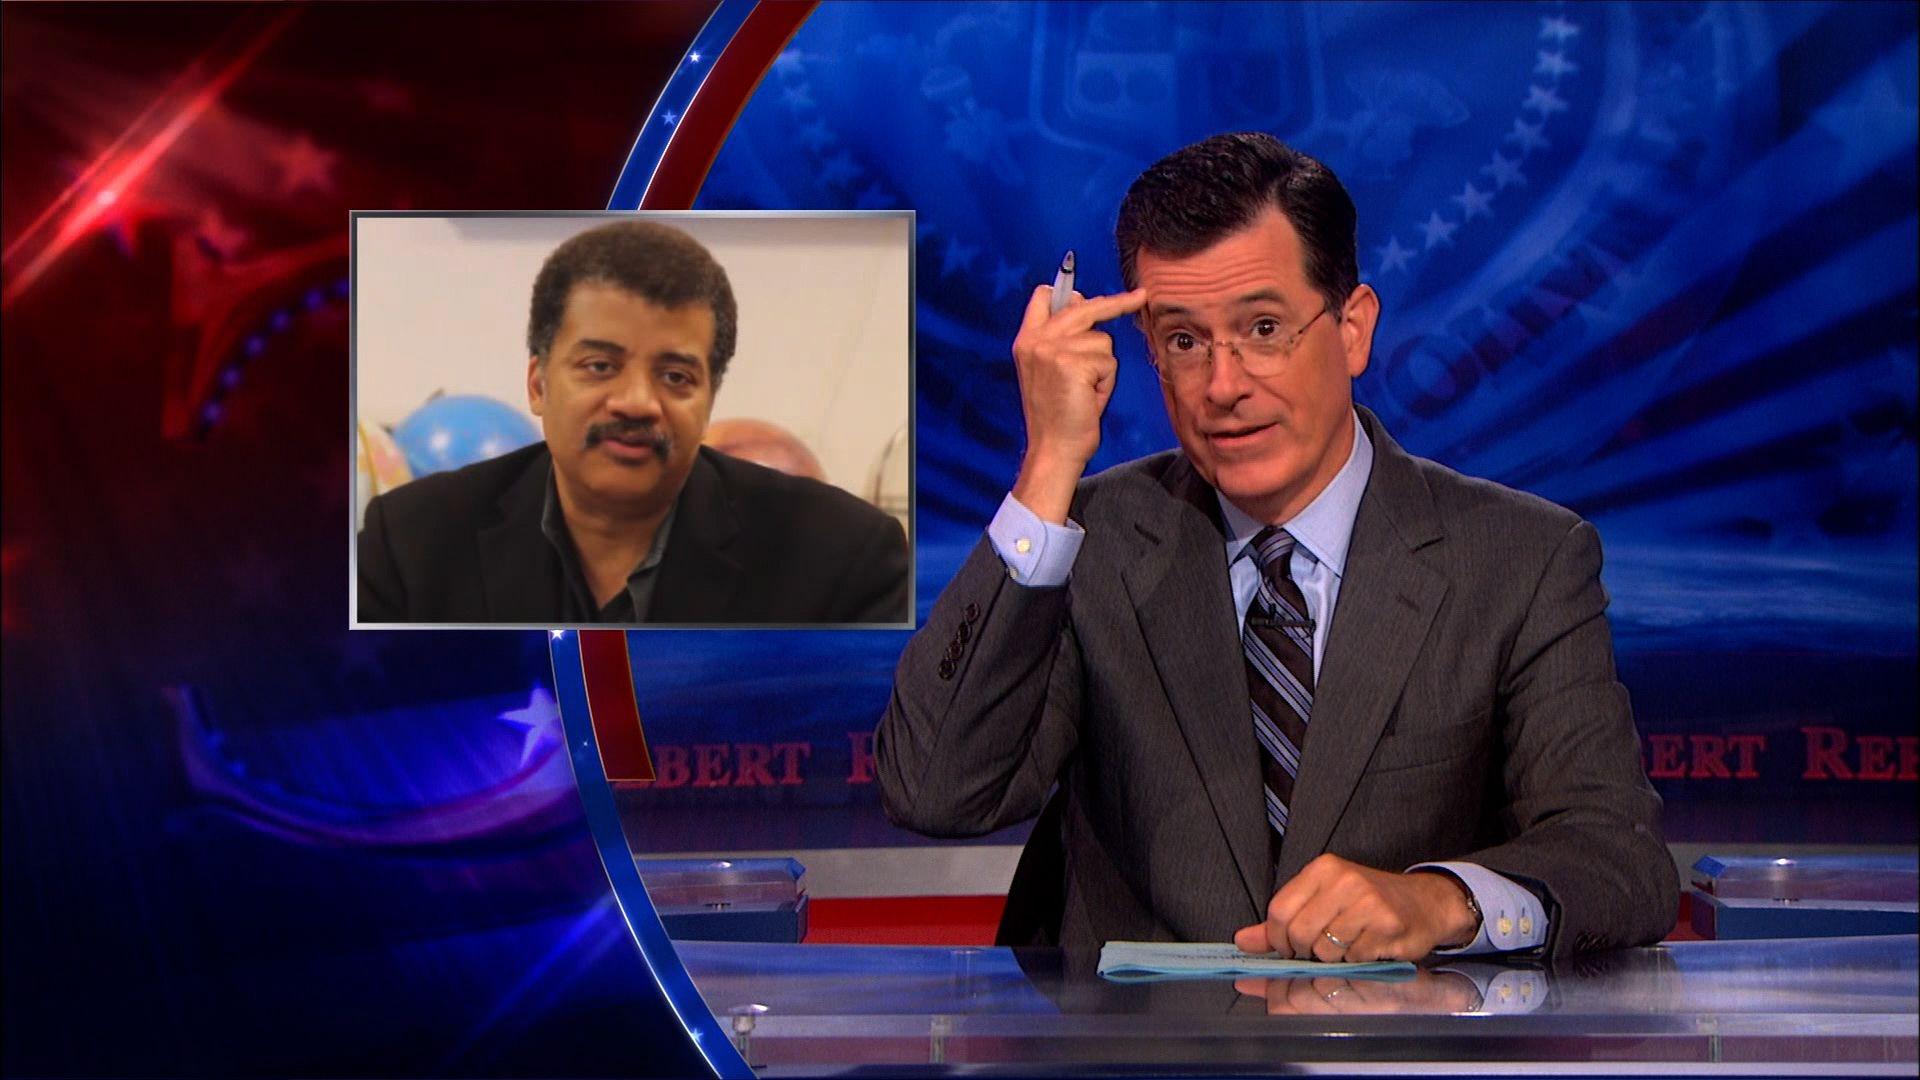 Stephen Colbert on Neil deGrasse Tyson's Alien Theory